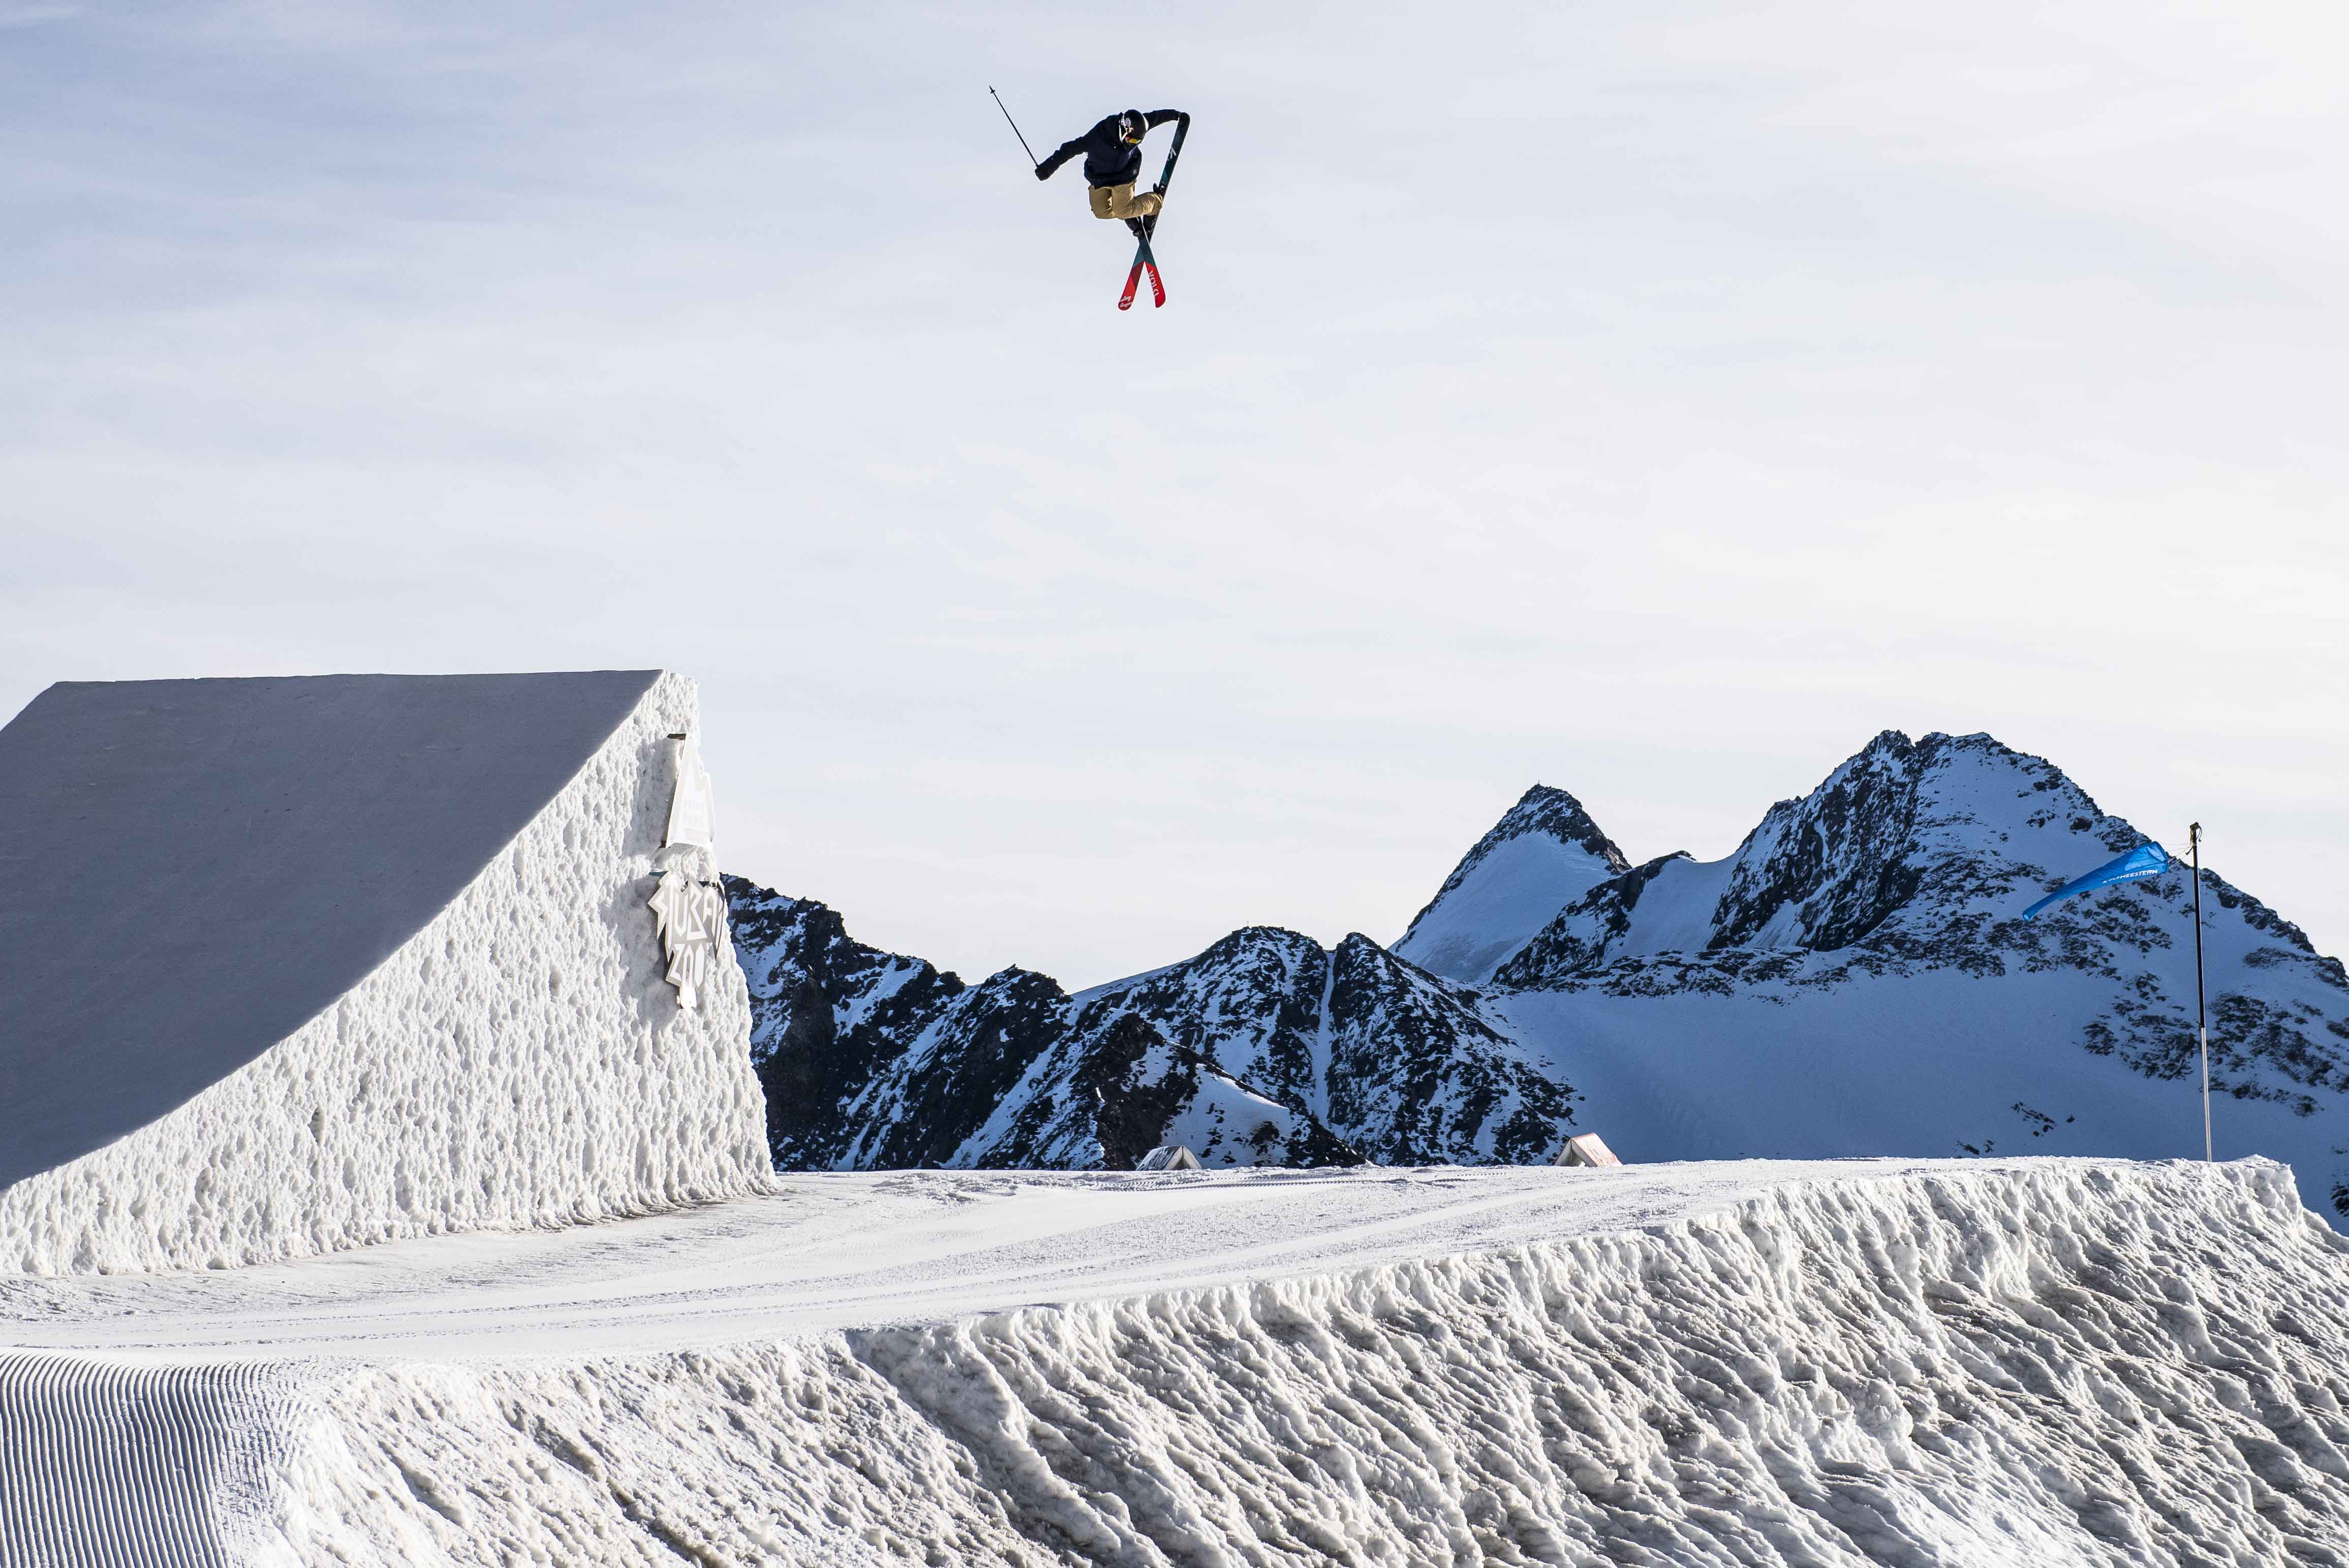 Skifahrer im Luft am skispringen